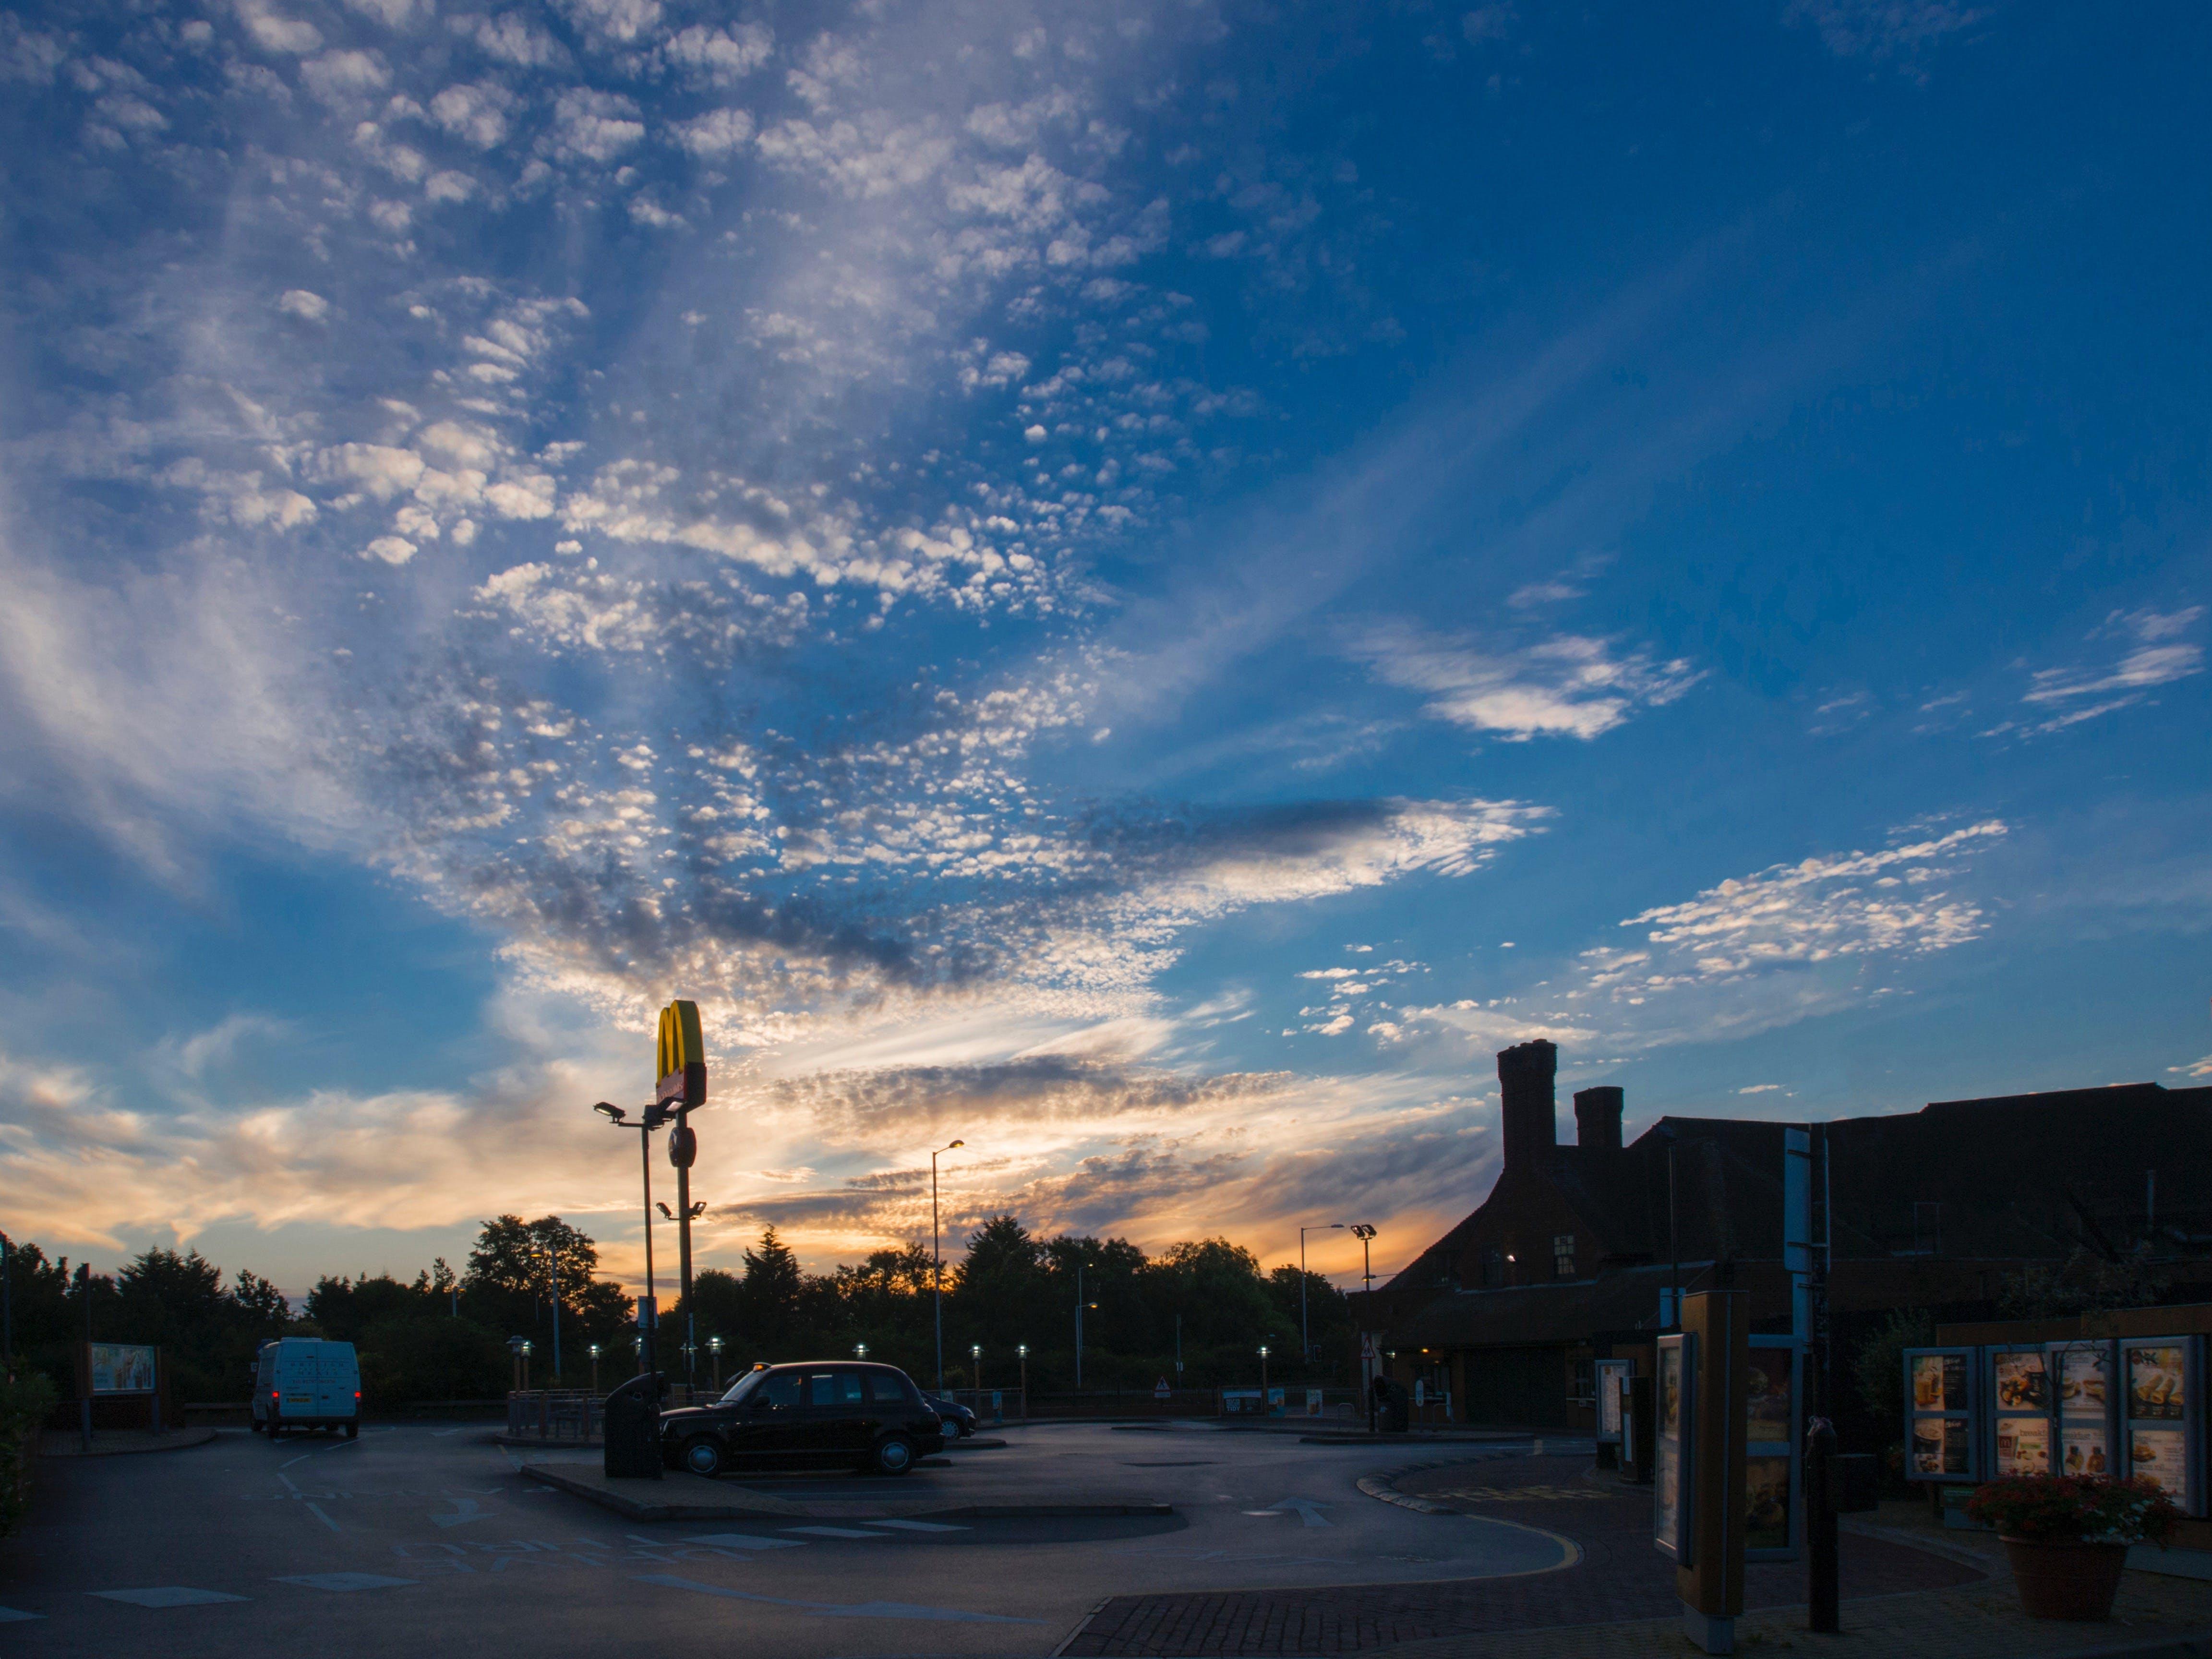 Sky During Daylight